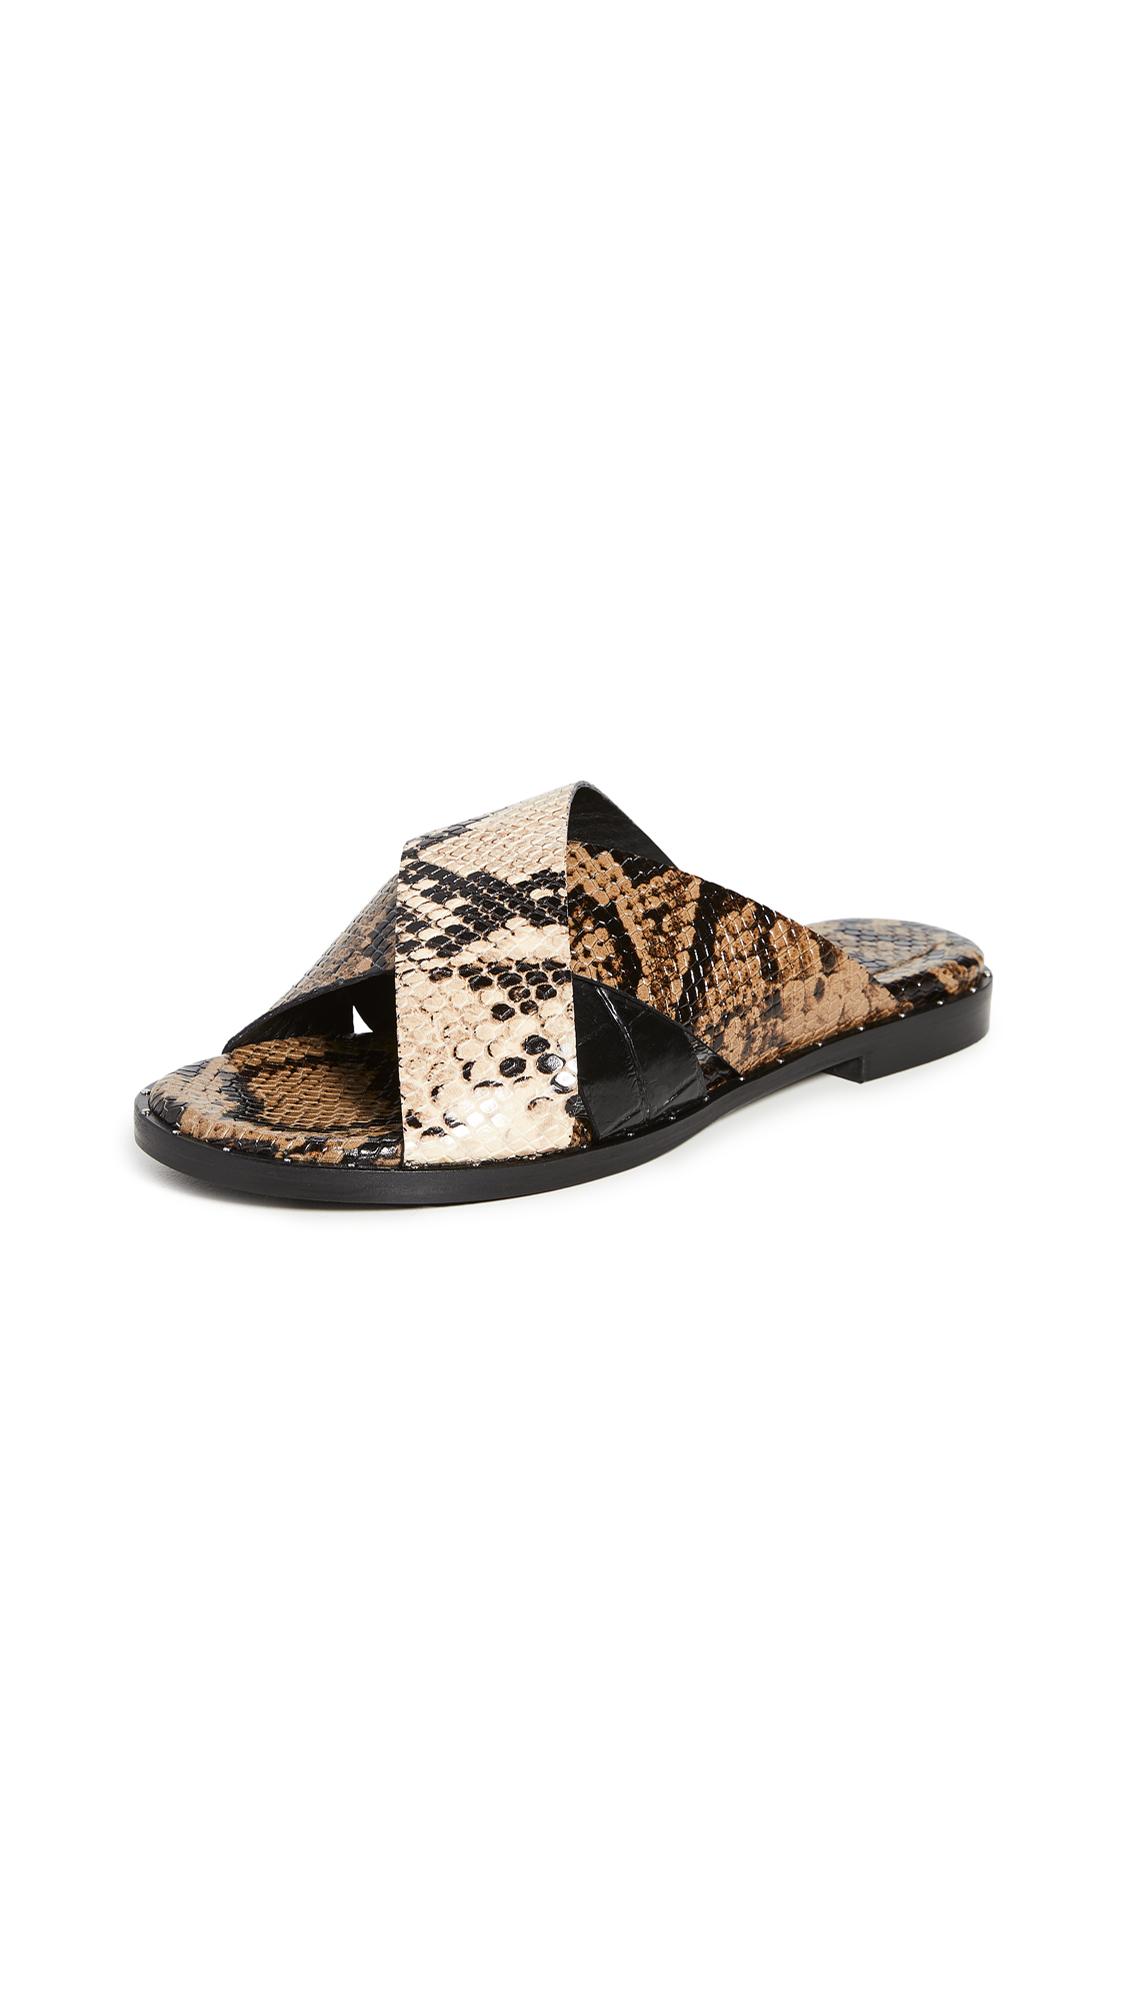 Freda Salvador Dew Cross Strap Sandals - 30% Off Sale